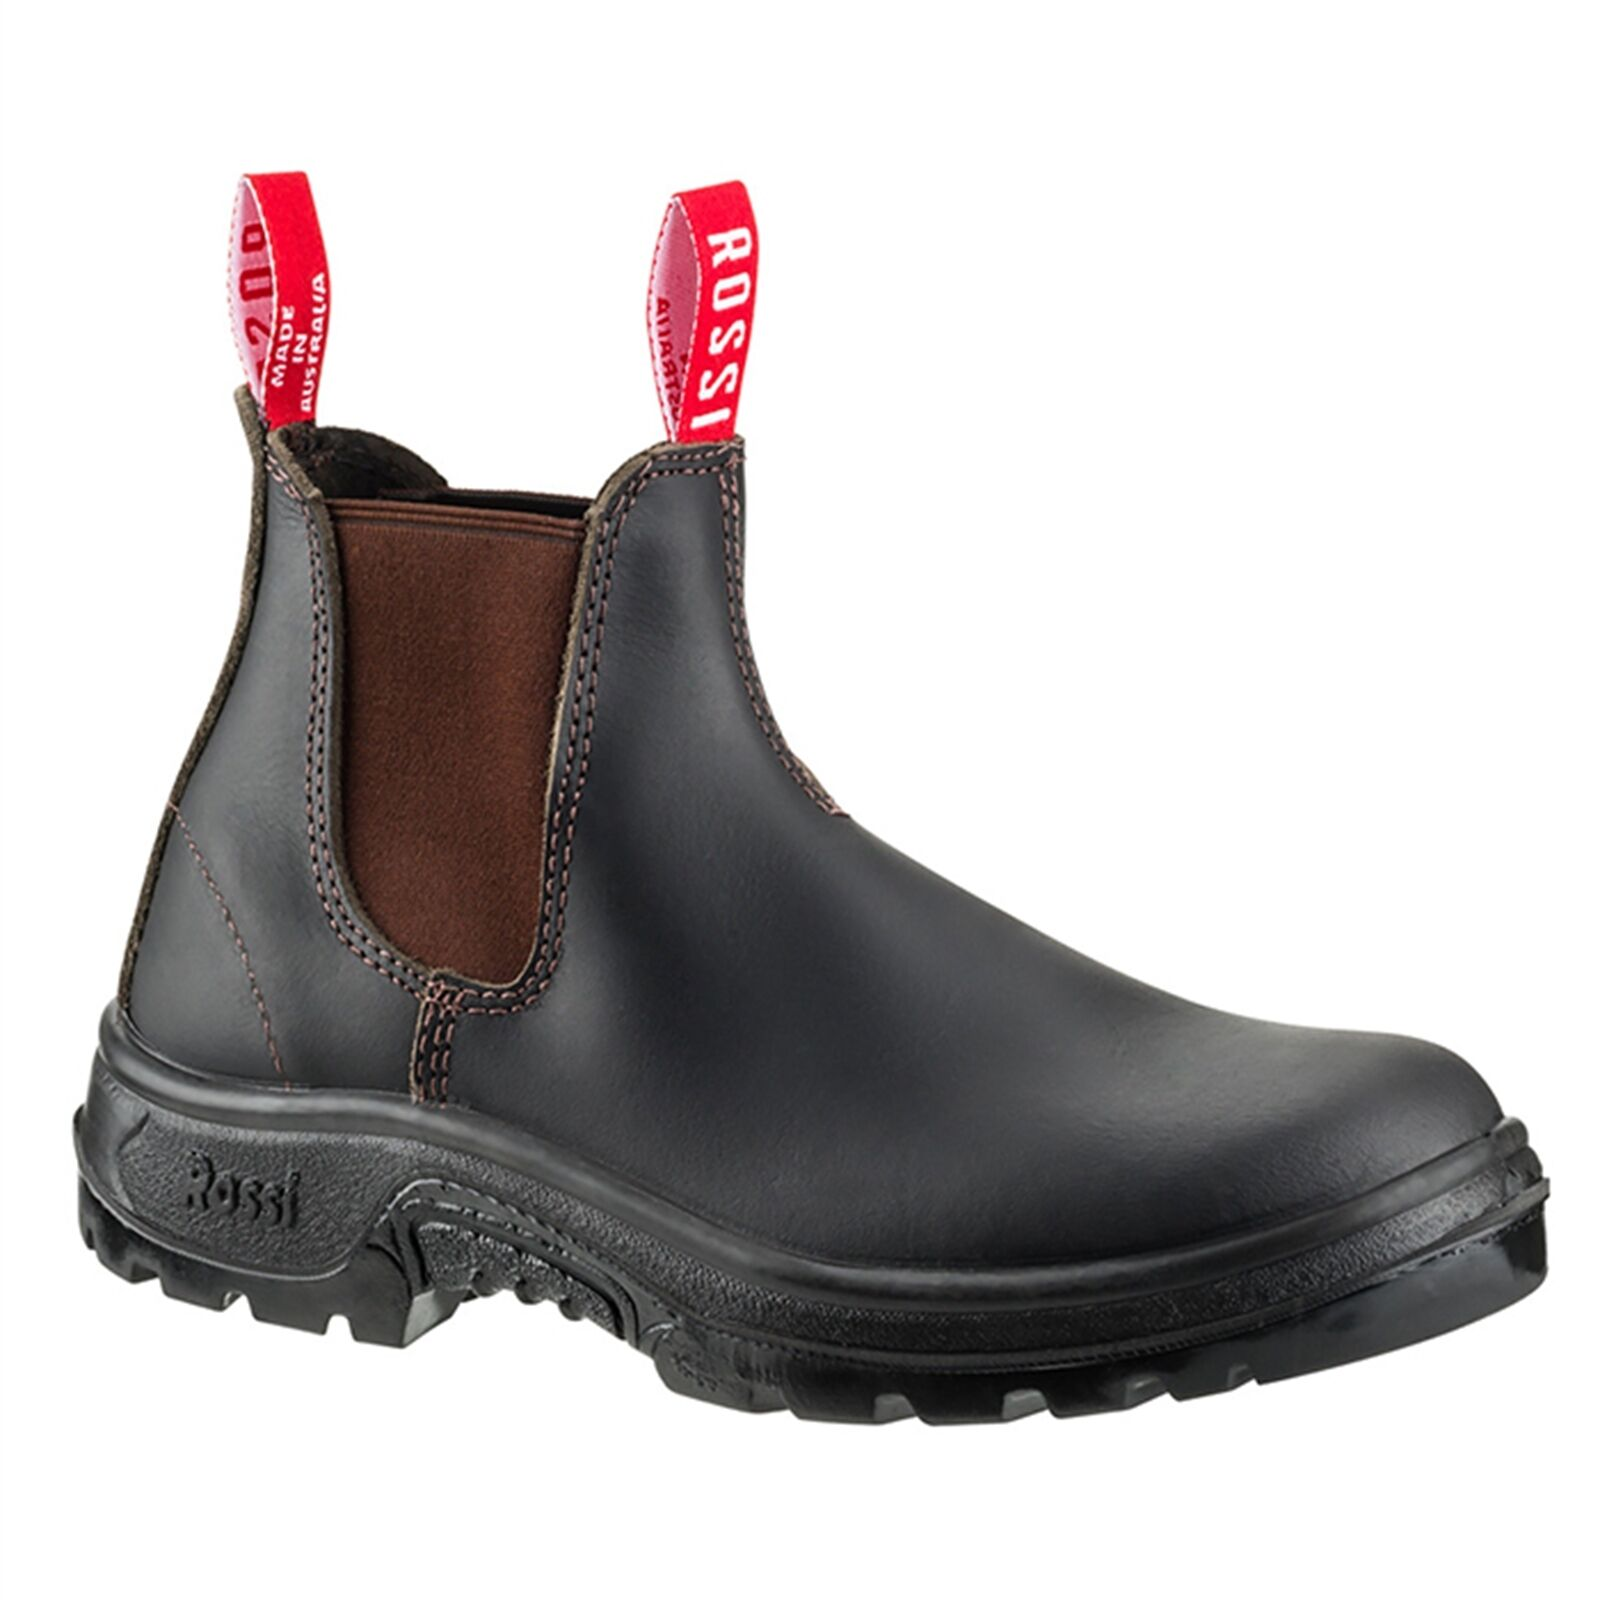 Men's Engineer Biker Motorcycle Leather Boots Black US Size Size US 6 7 8 9 10 11 12 13 cf9cef